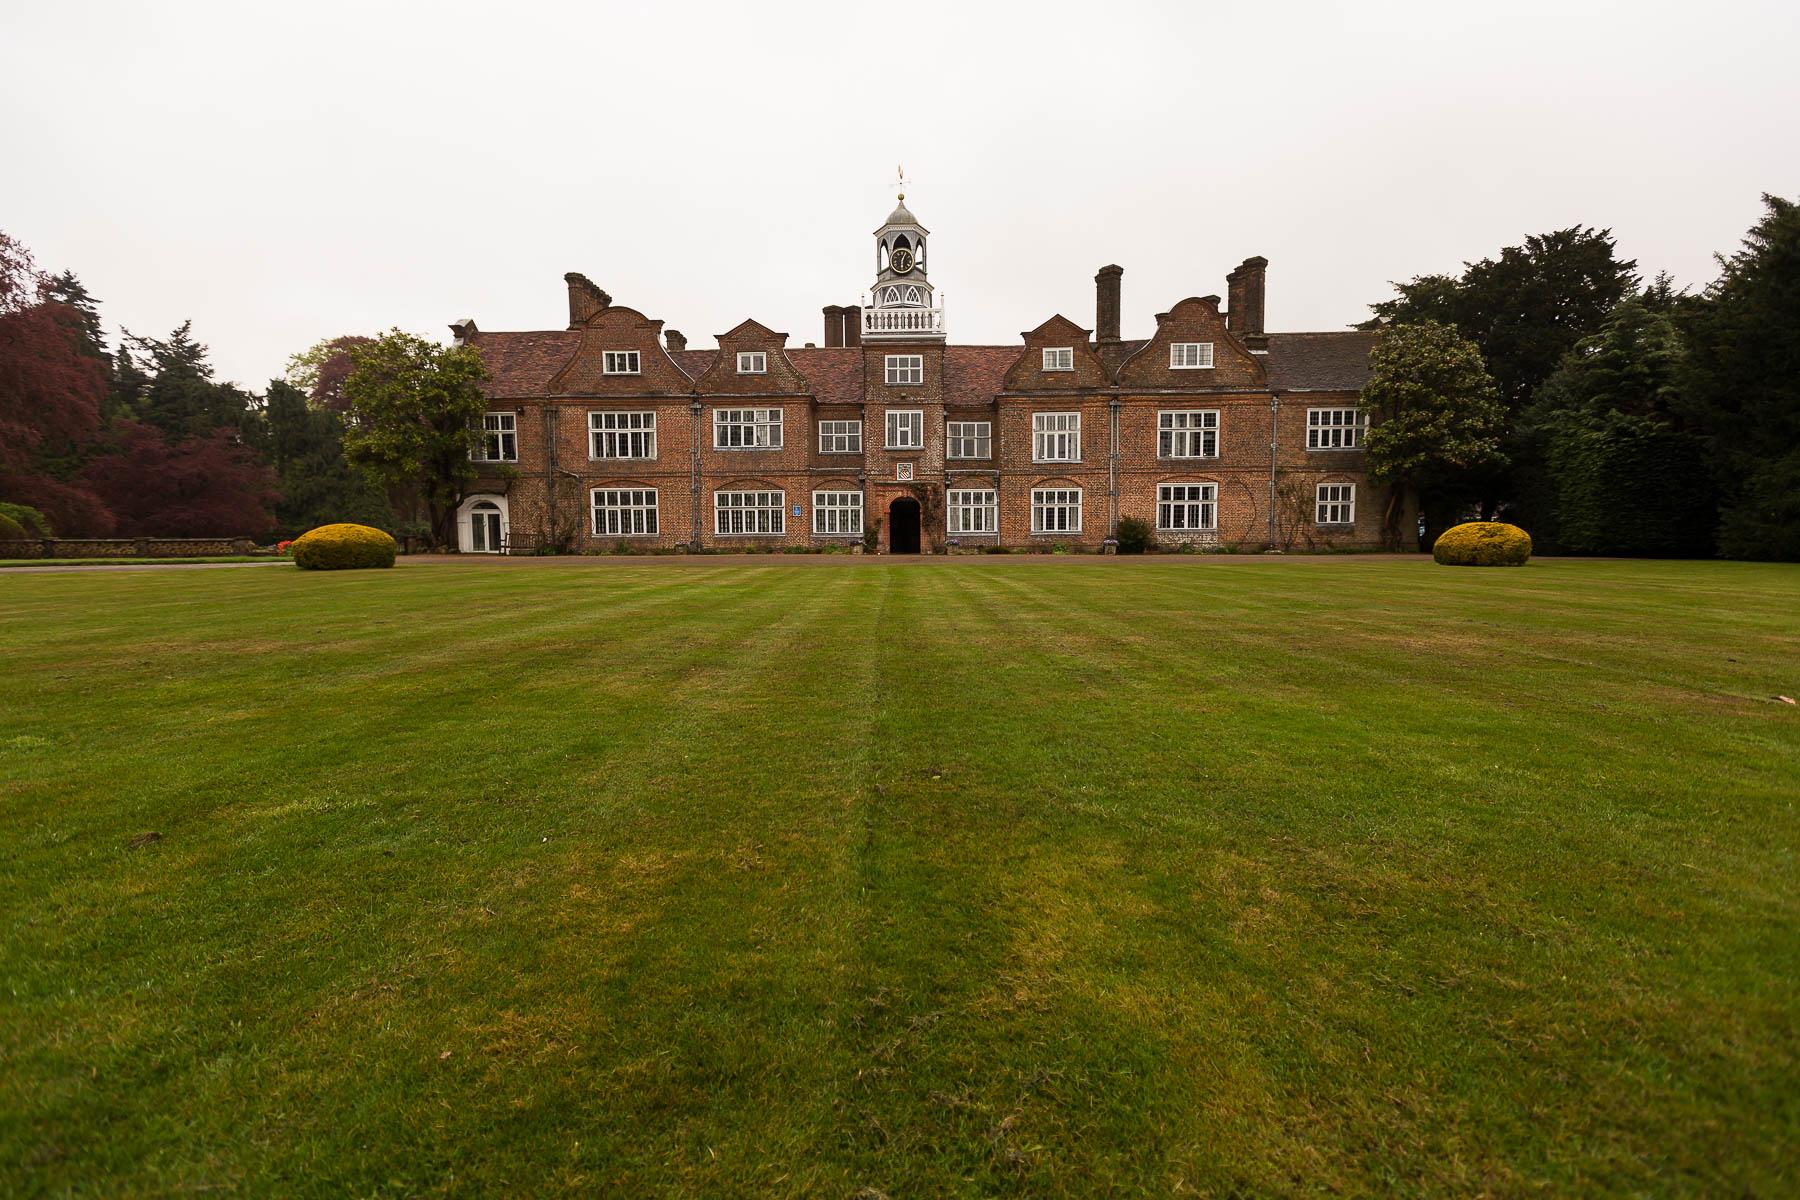 Rothamsted Manor harpenden, hertfordshire, wedding inspiration